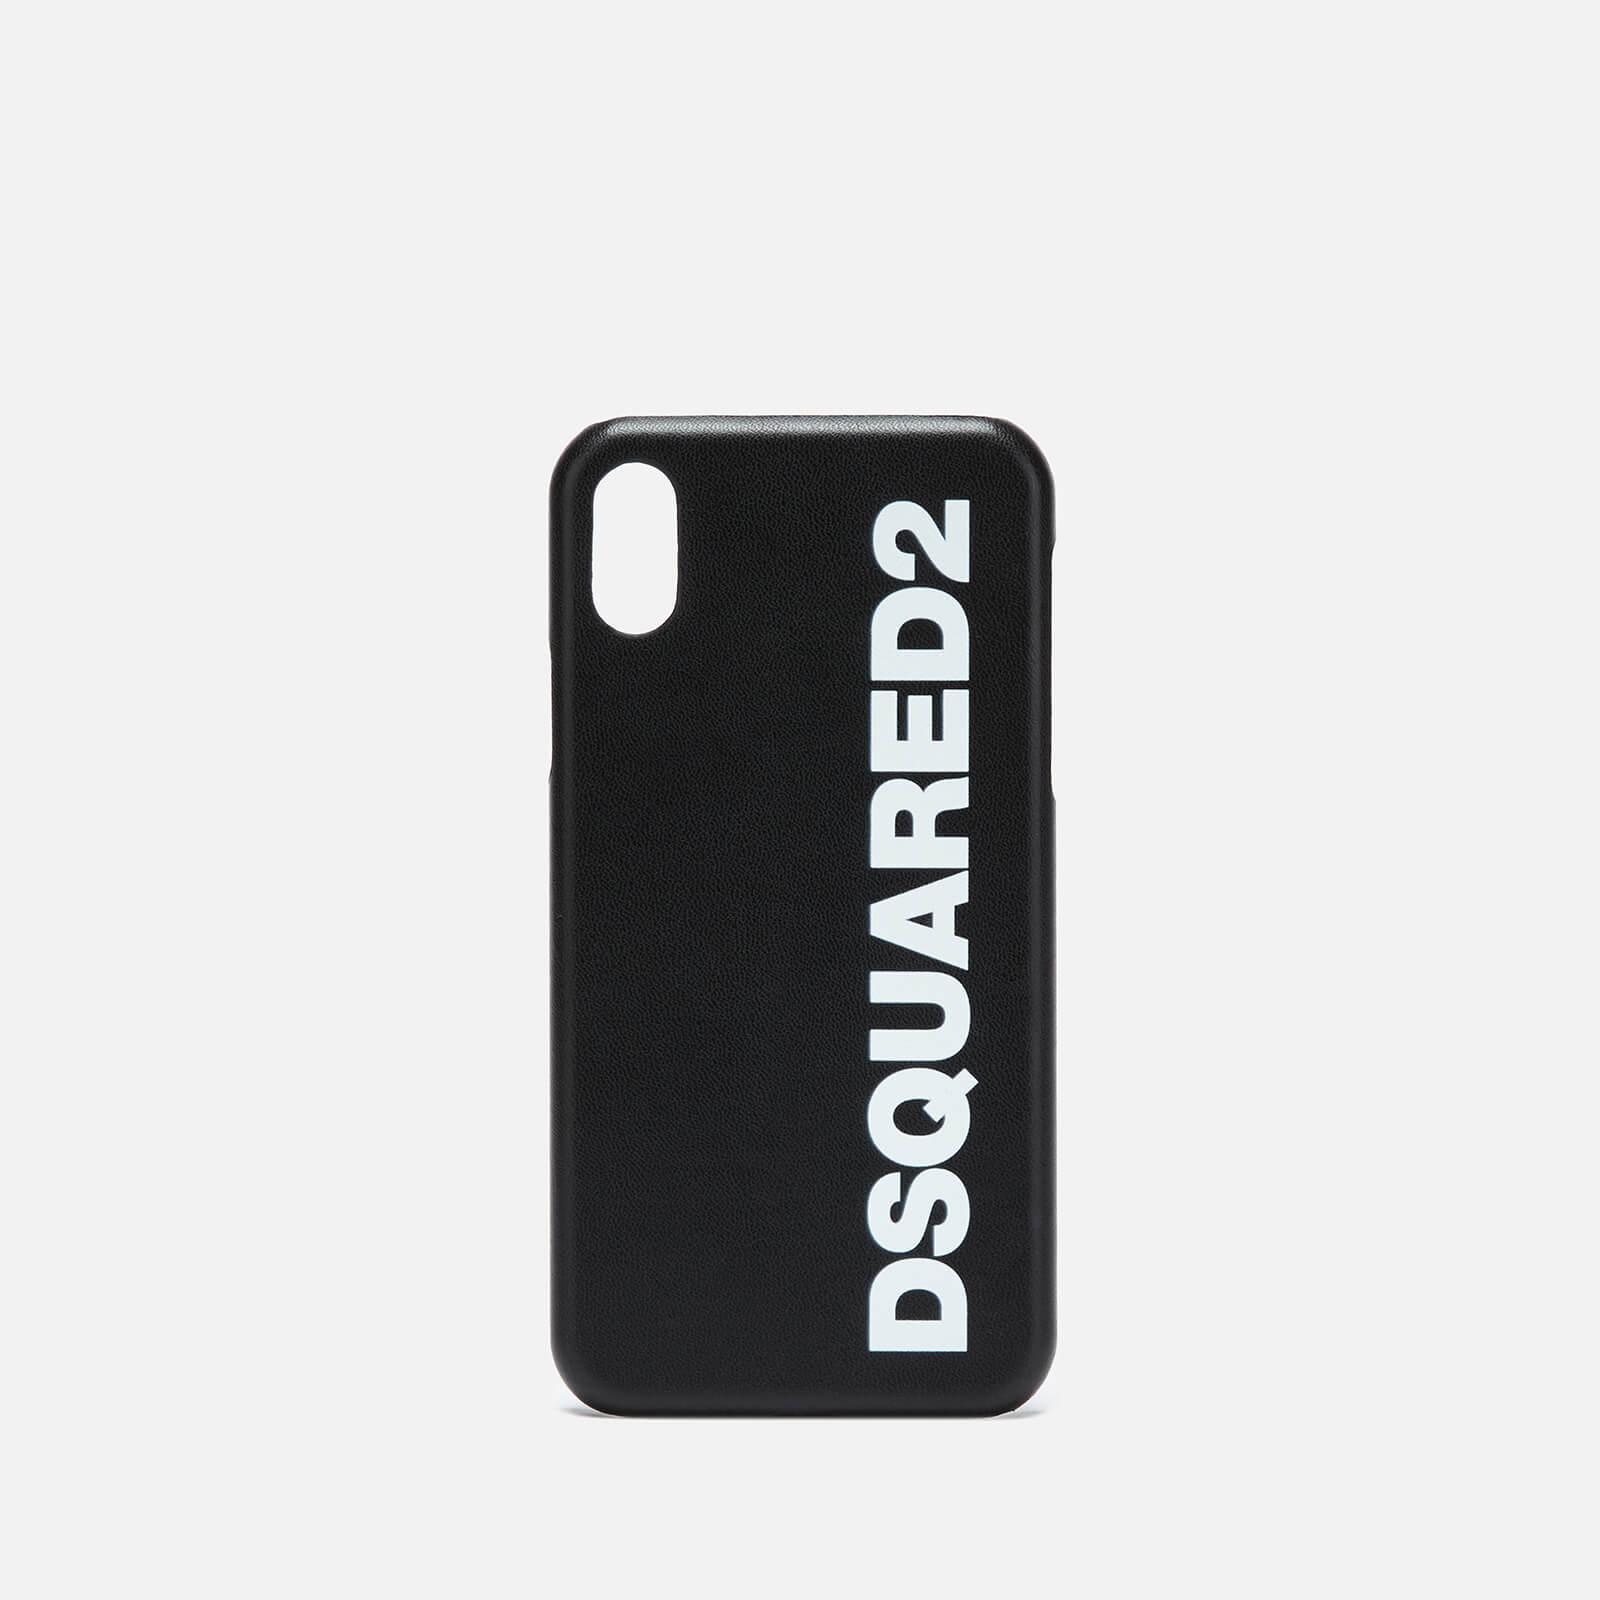 b3a4ce25 Dsquared2 Men's iPhone X Cover - Black/White